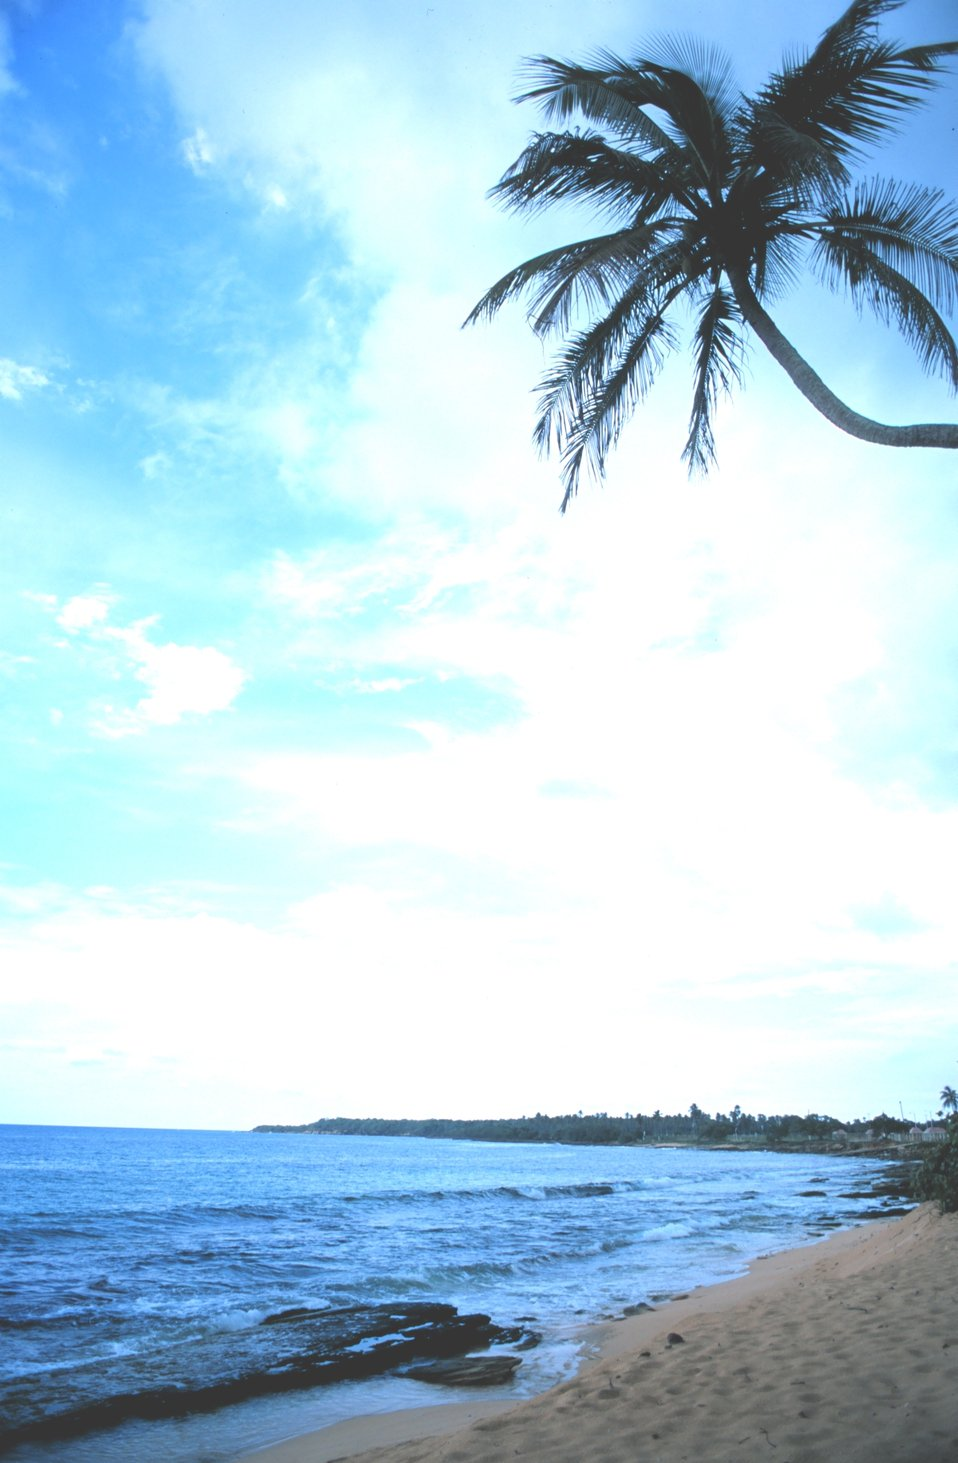 Beach near Puerto Nuevo